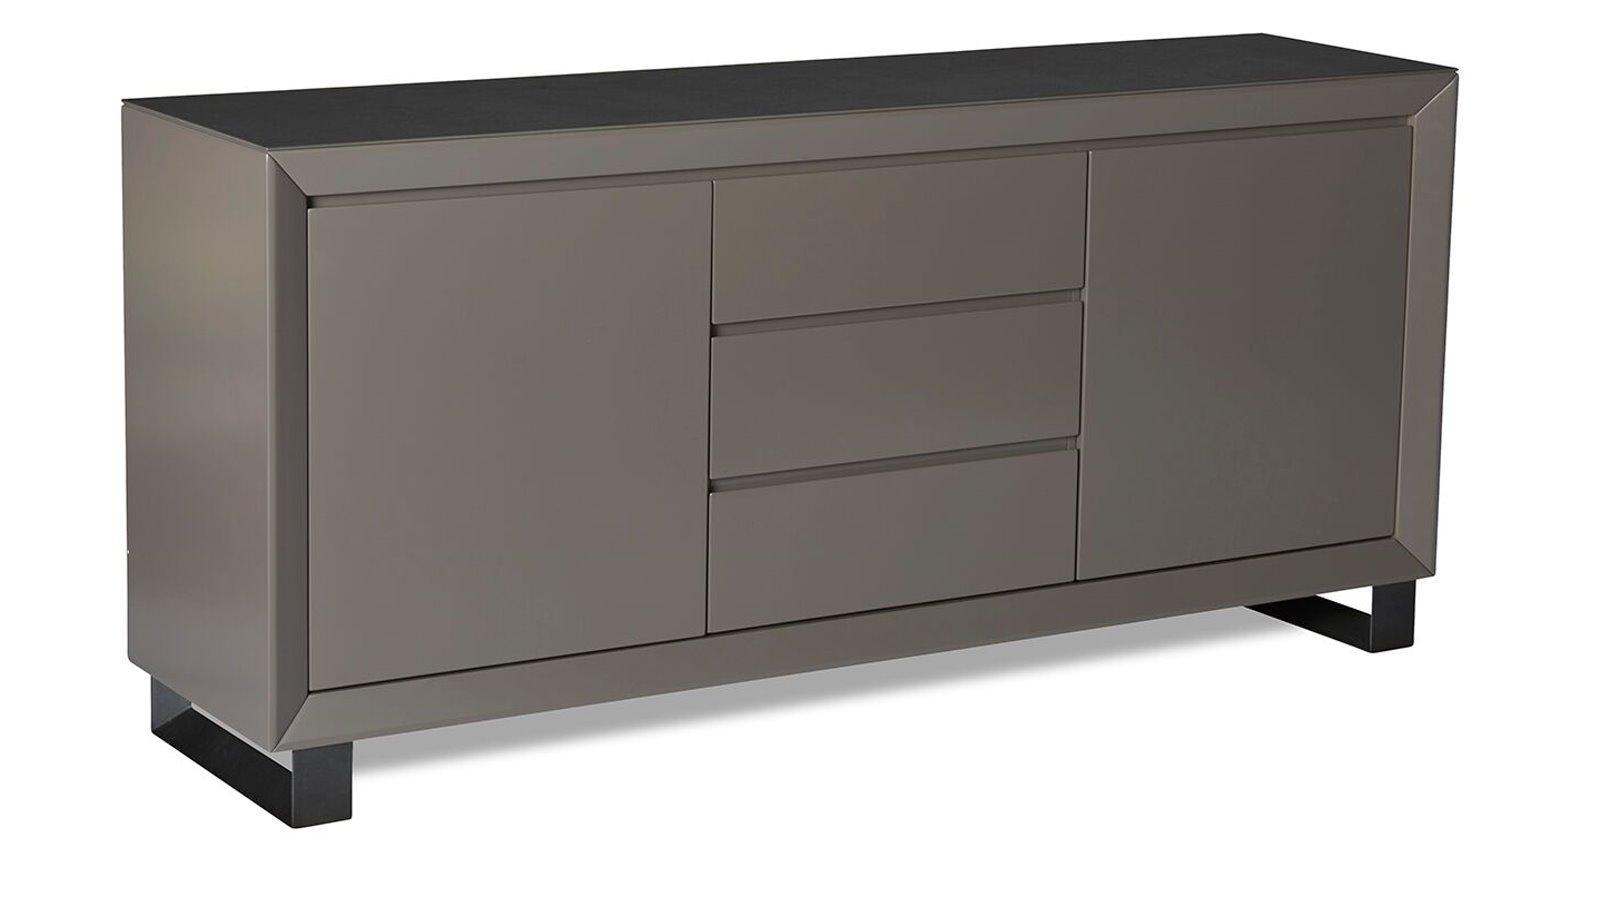 Sideboard Marlo Kommode Anrichte Grauschwarz Keramik Dynamic 24de